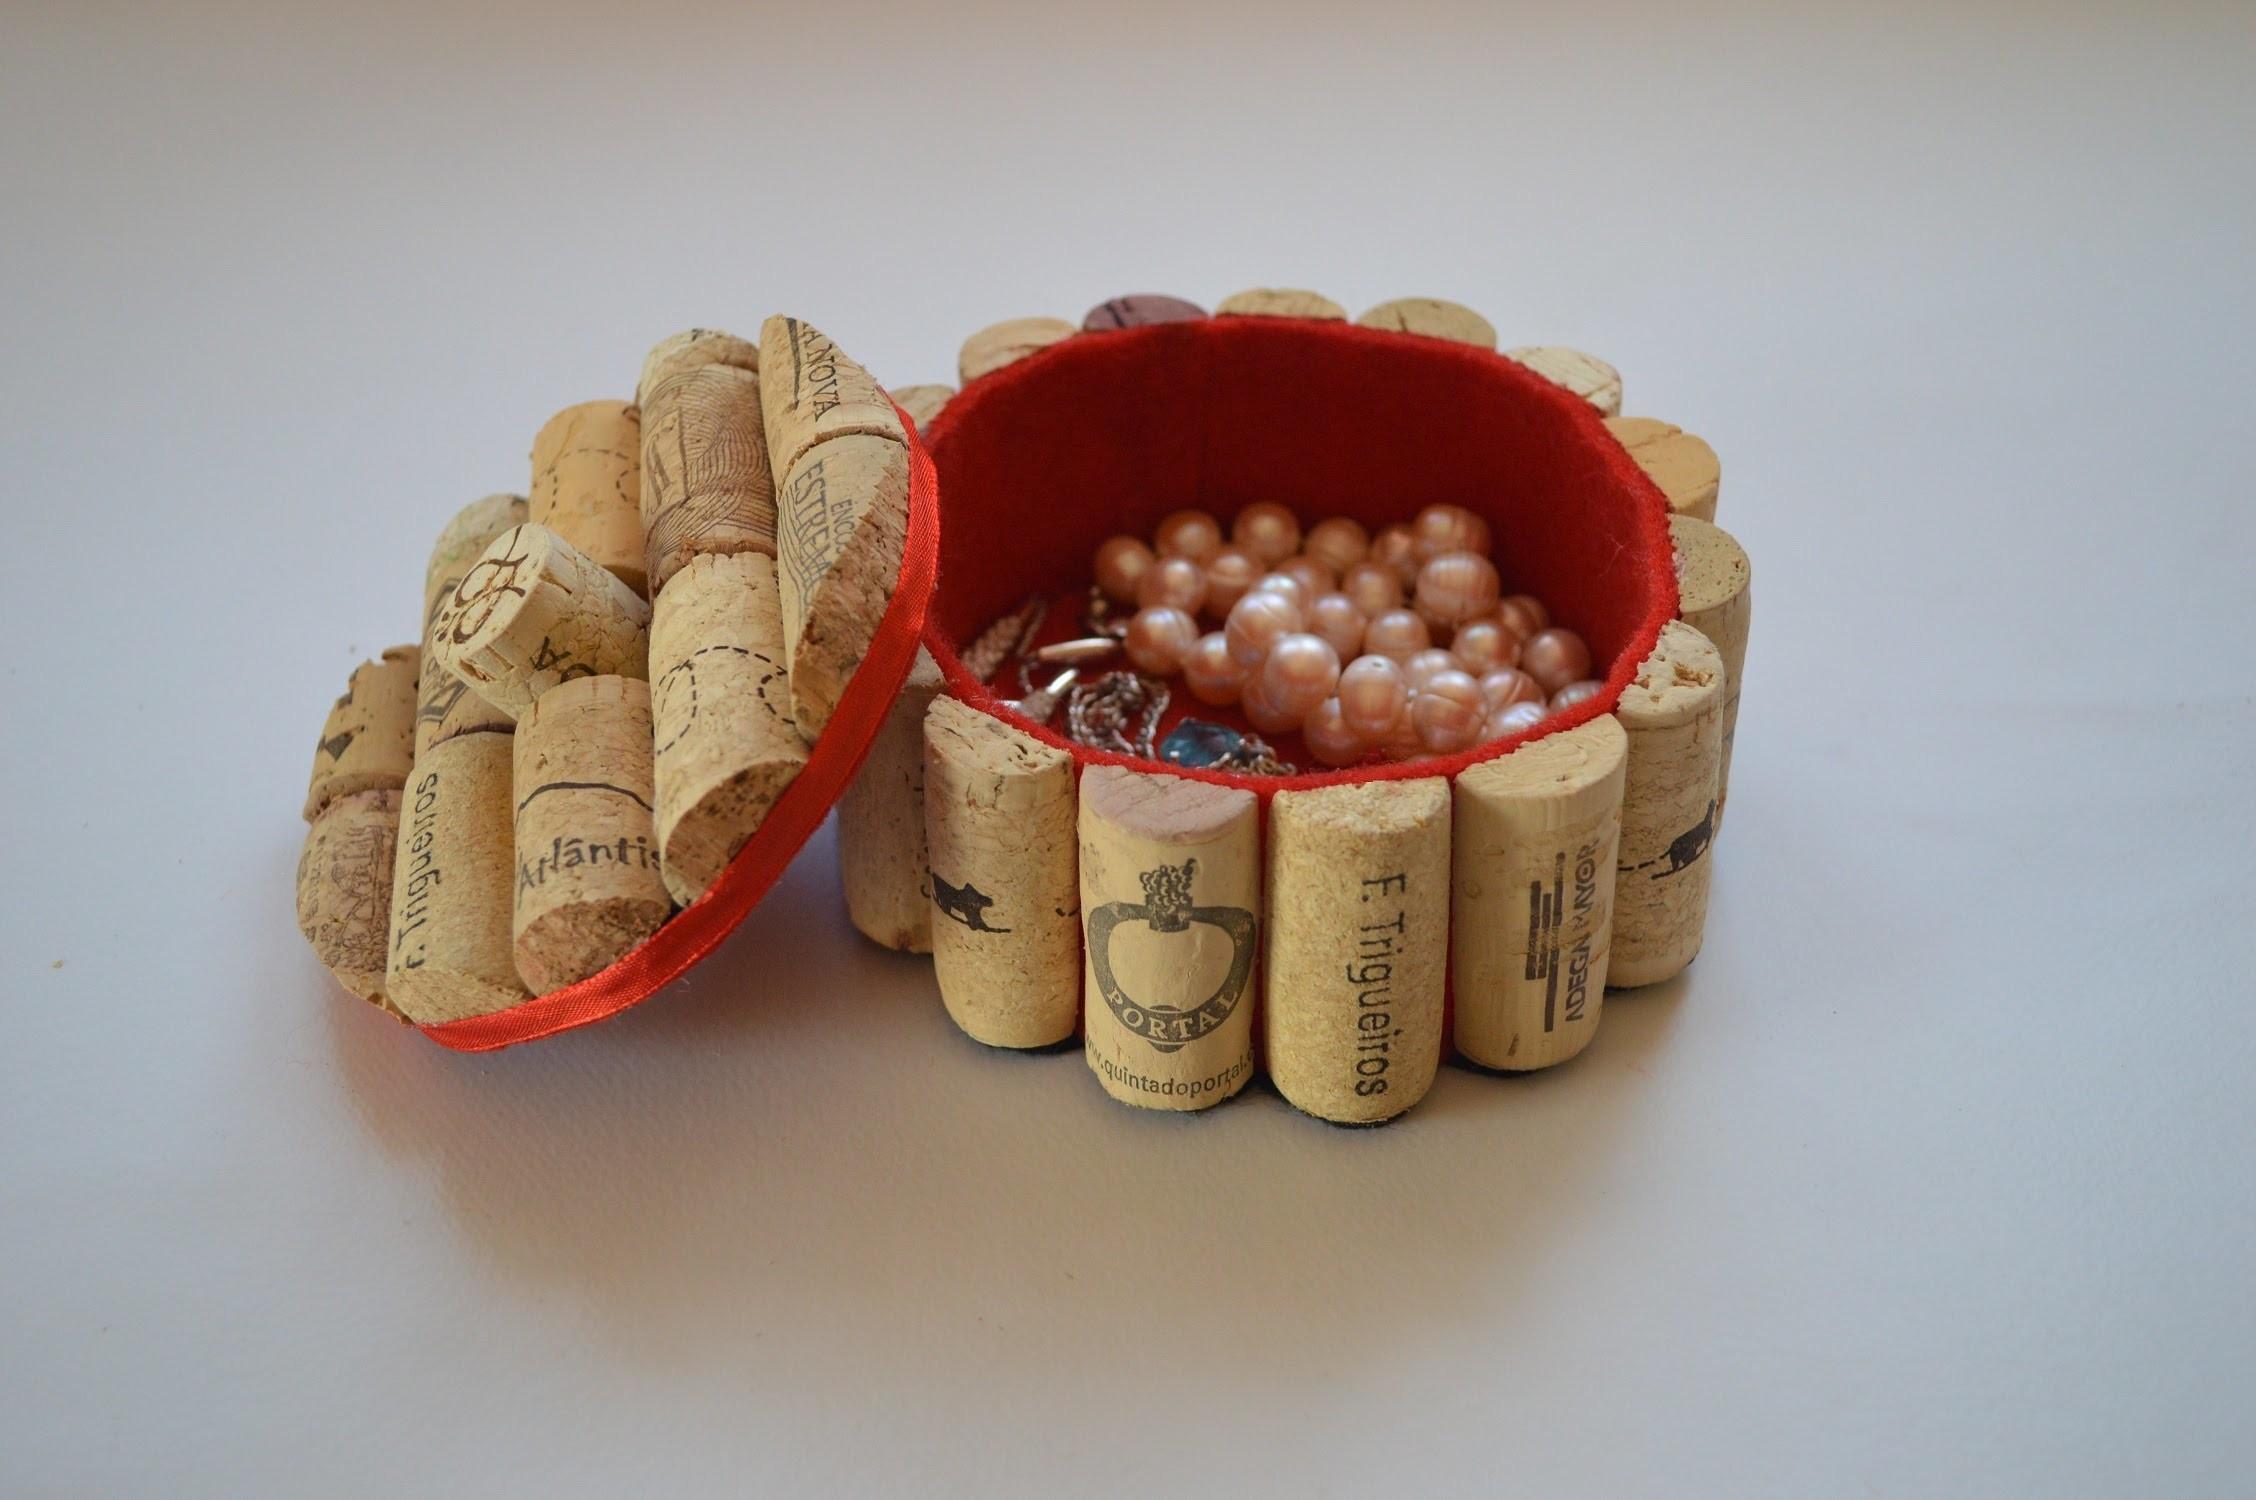 Como hacer un joyero con tapones de corcho - How to make a jewelry box with corks